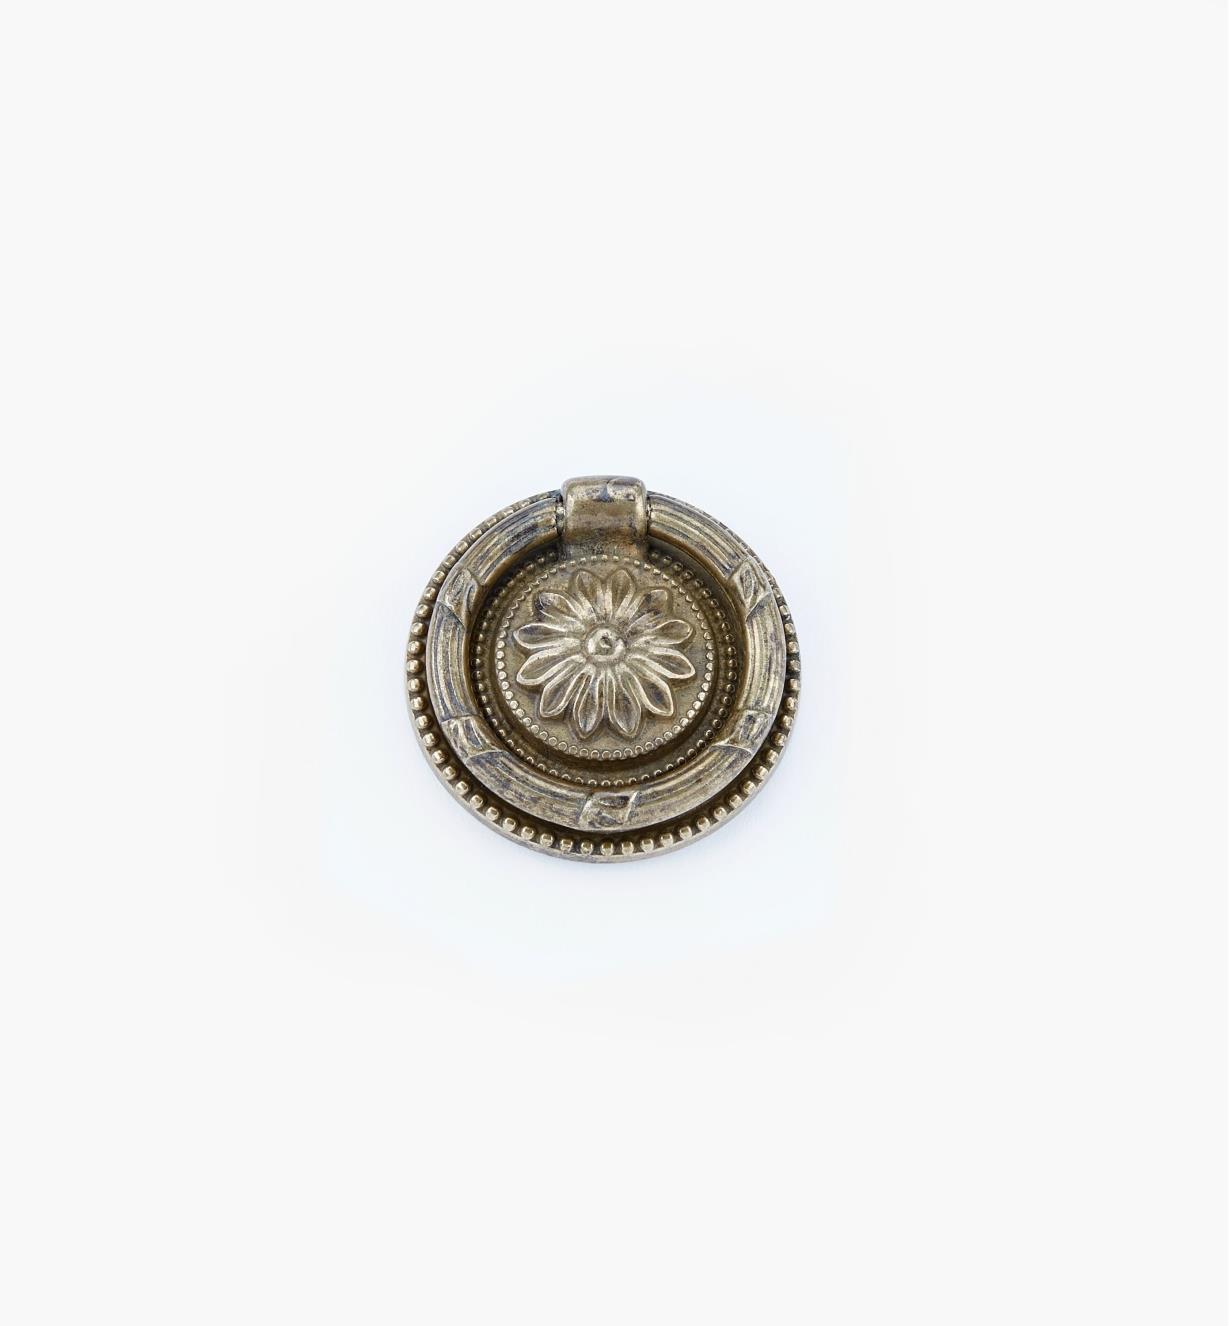 01A7447 - Poignée à anneau Louis XVI, laiton ancien, 47mm